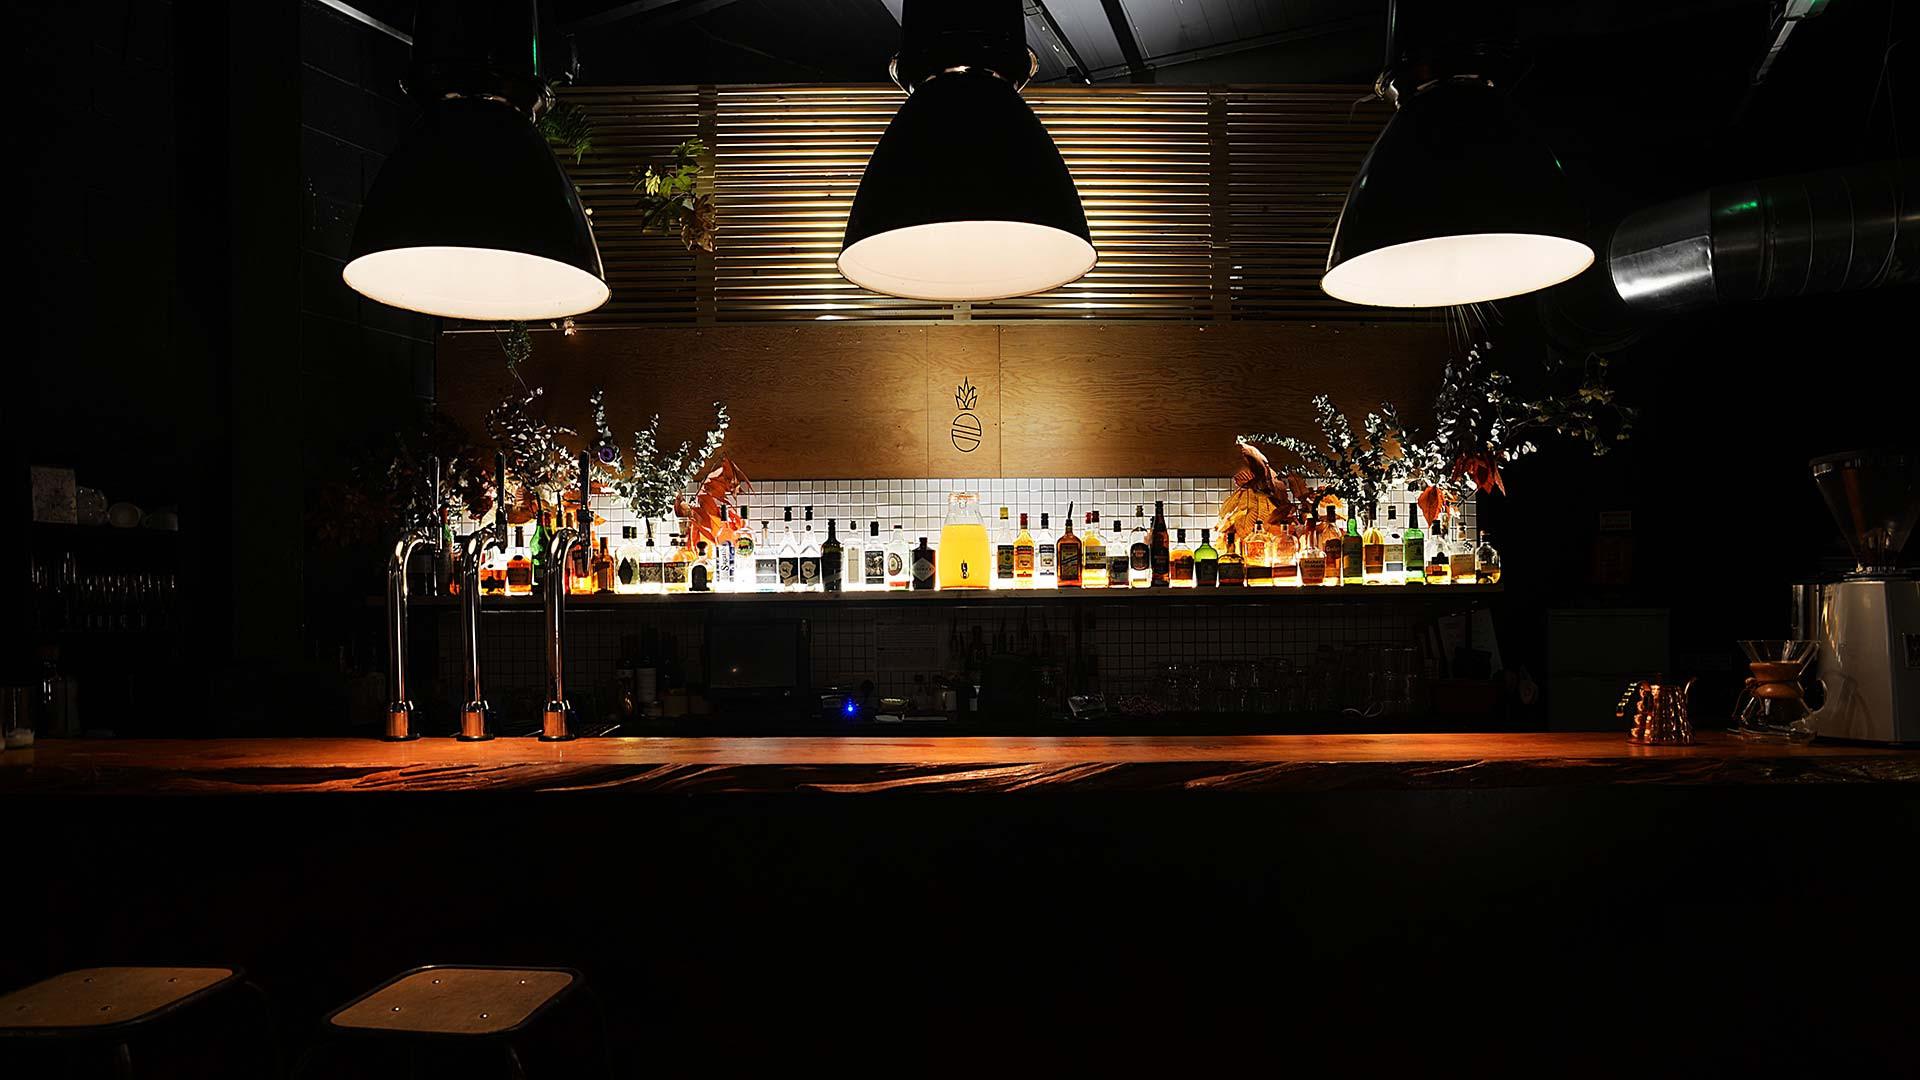 Caribbean restaurants in London - Buster Mantis